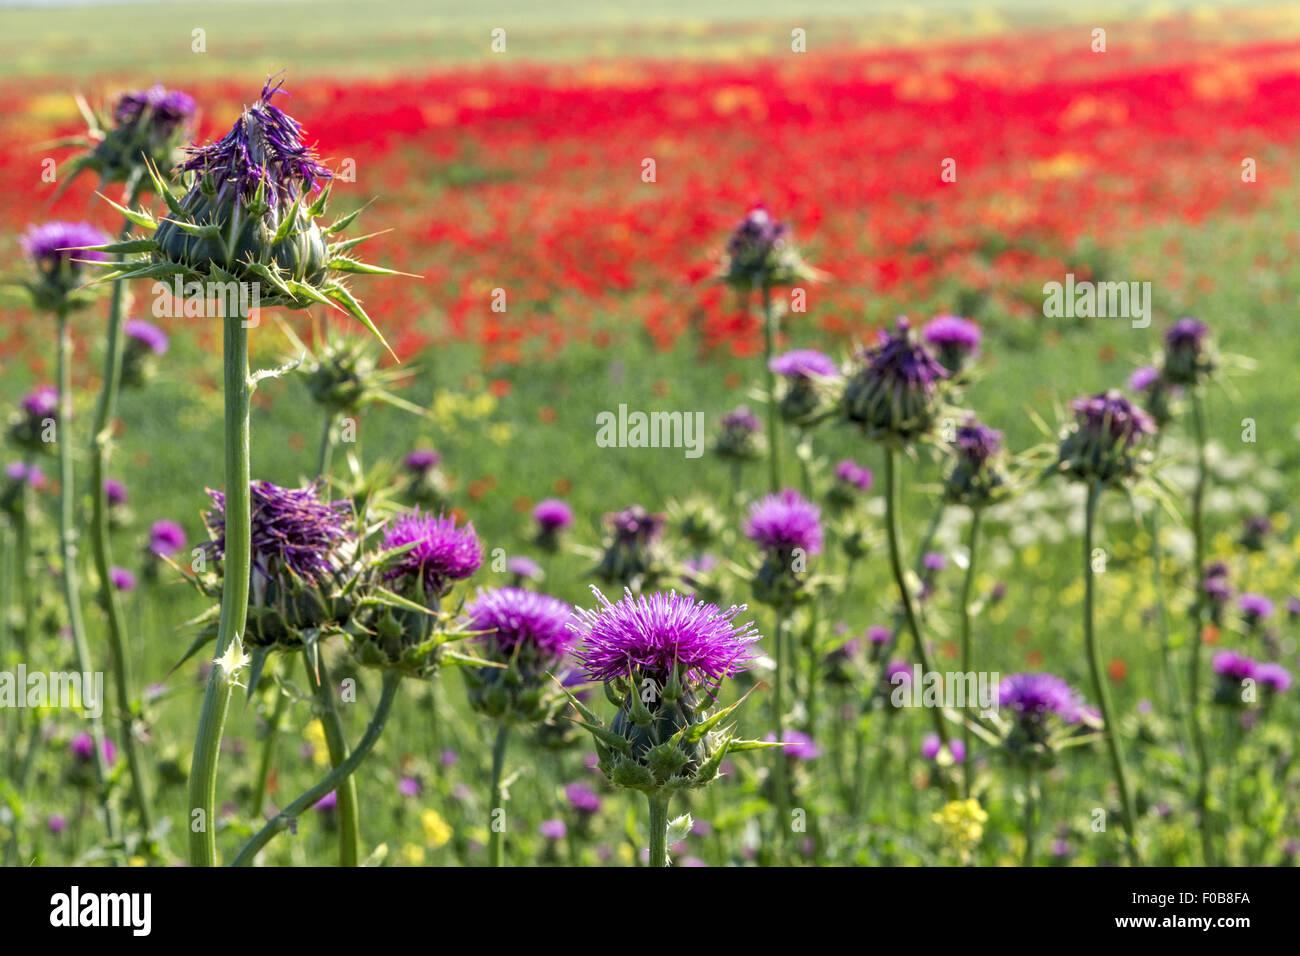 Poppies & Thistles in fields Azerbaijan - Stock Image